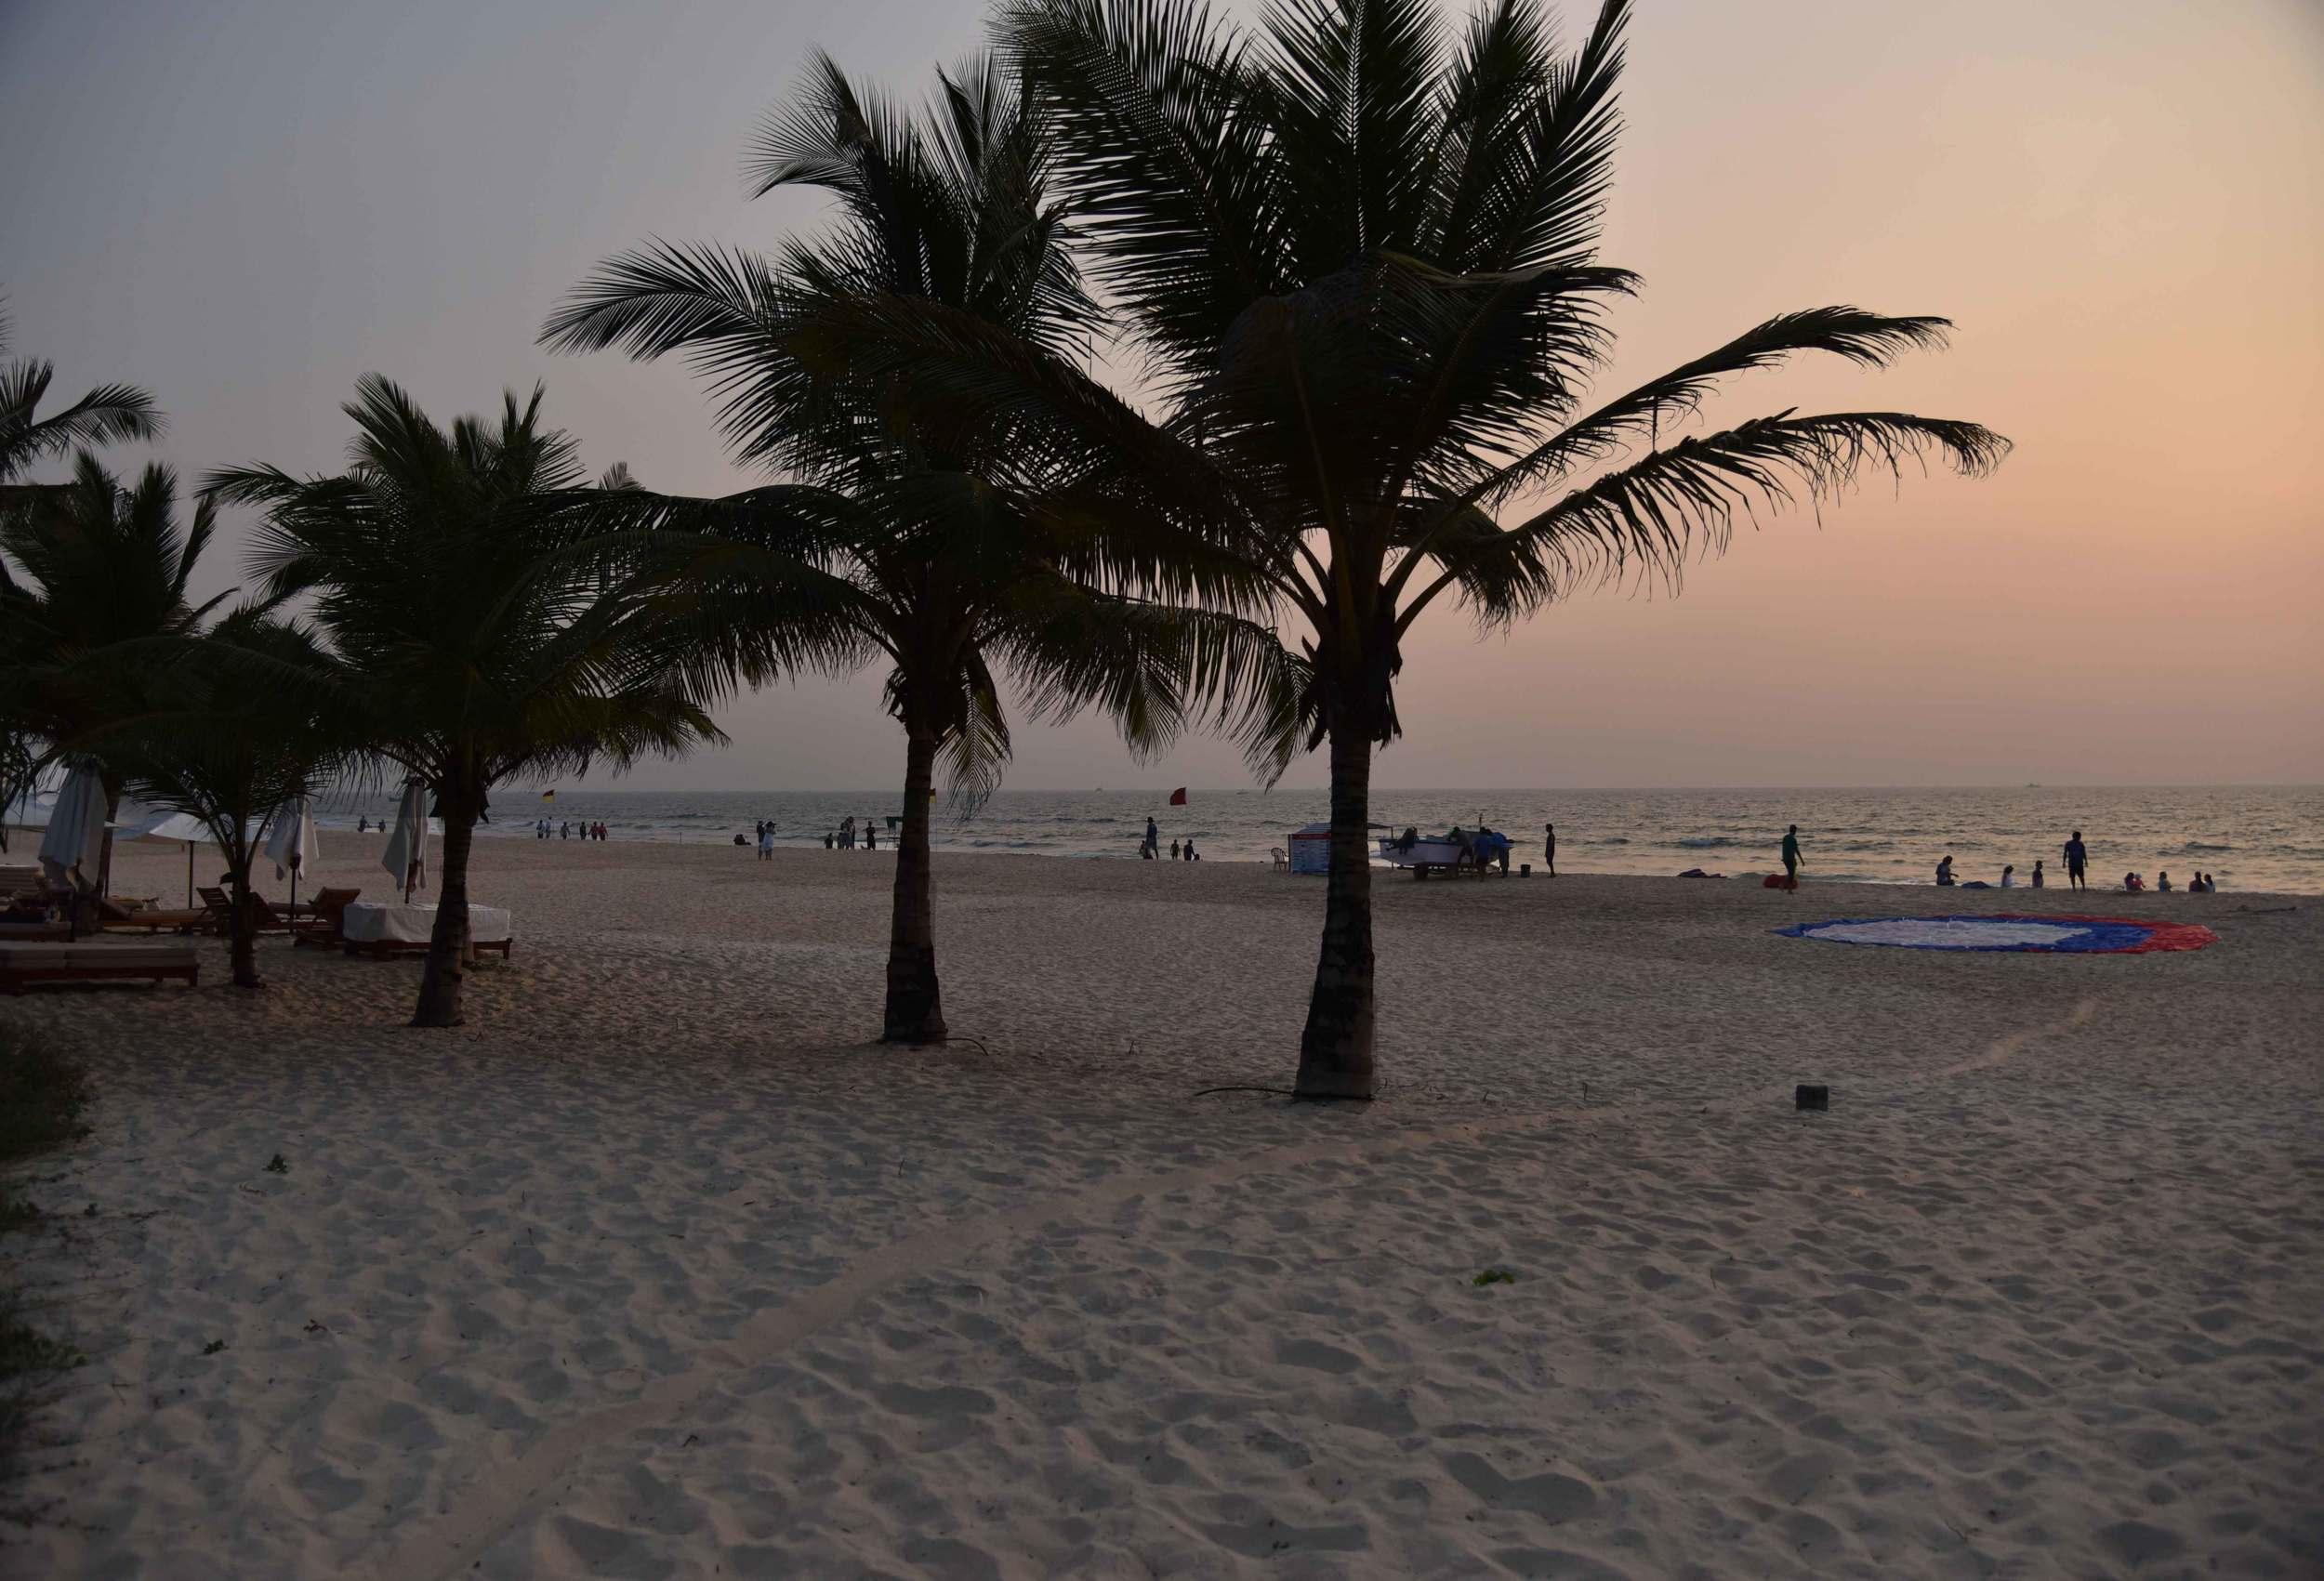 Arossim Beach,Goa, Arabian Sea, India. Image©thingstodot.com